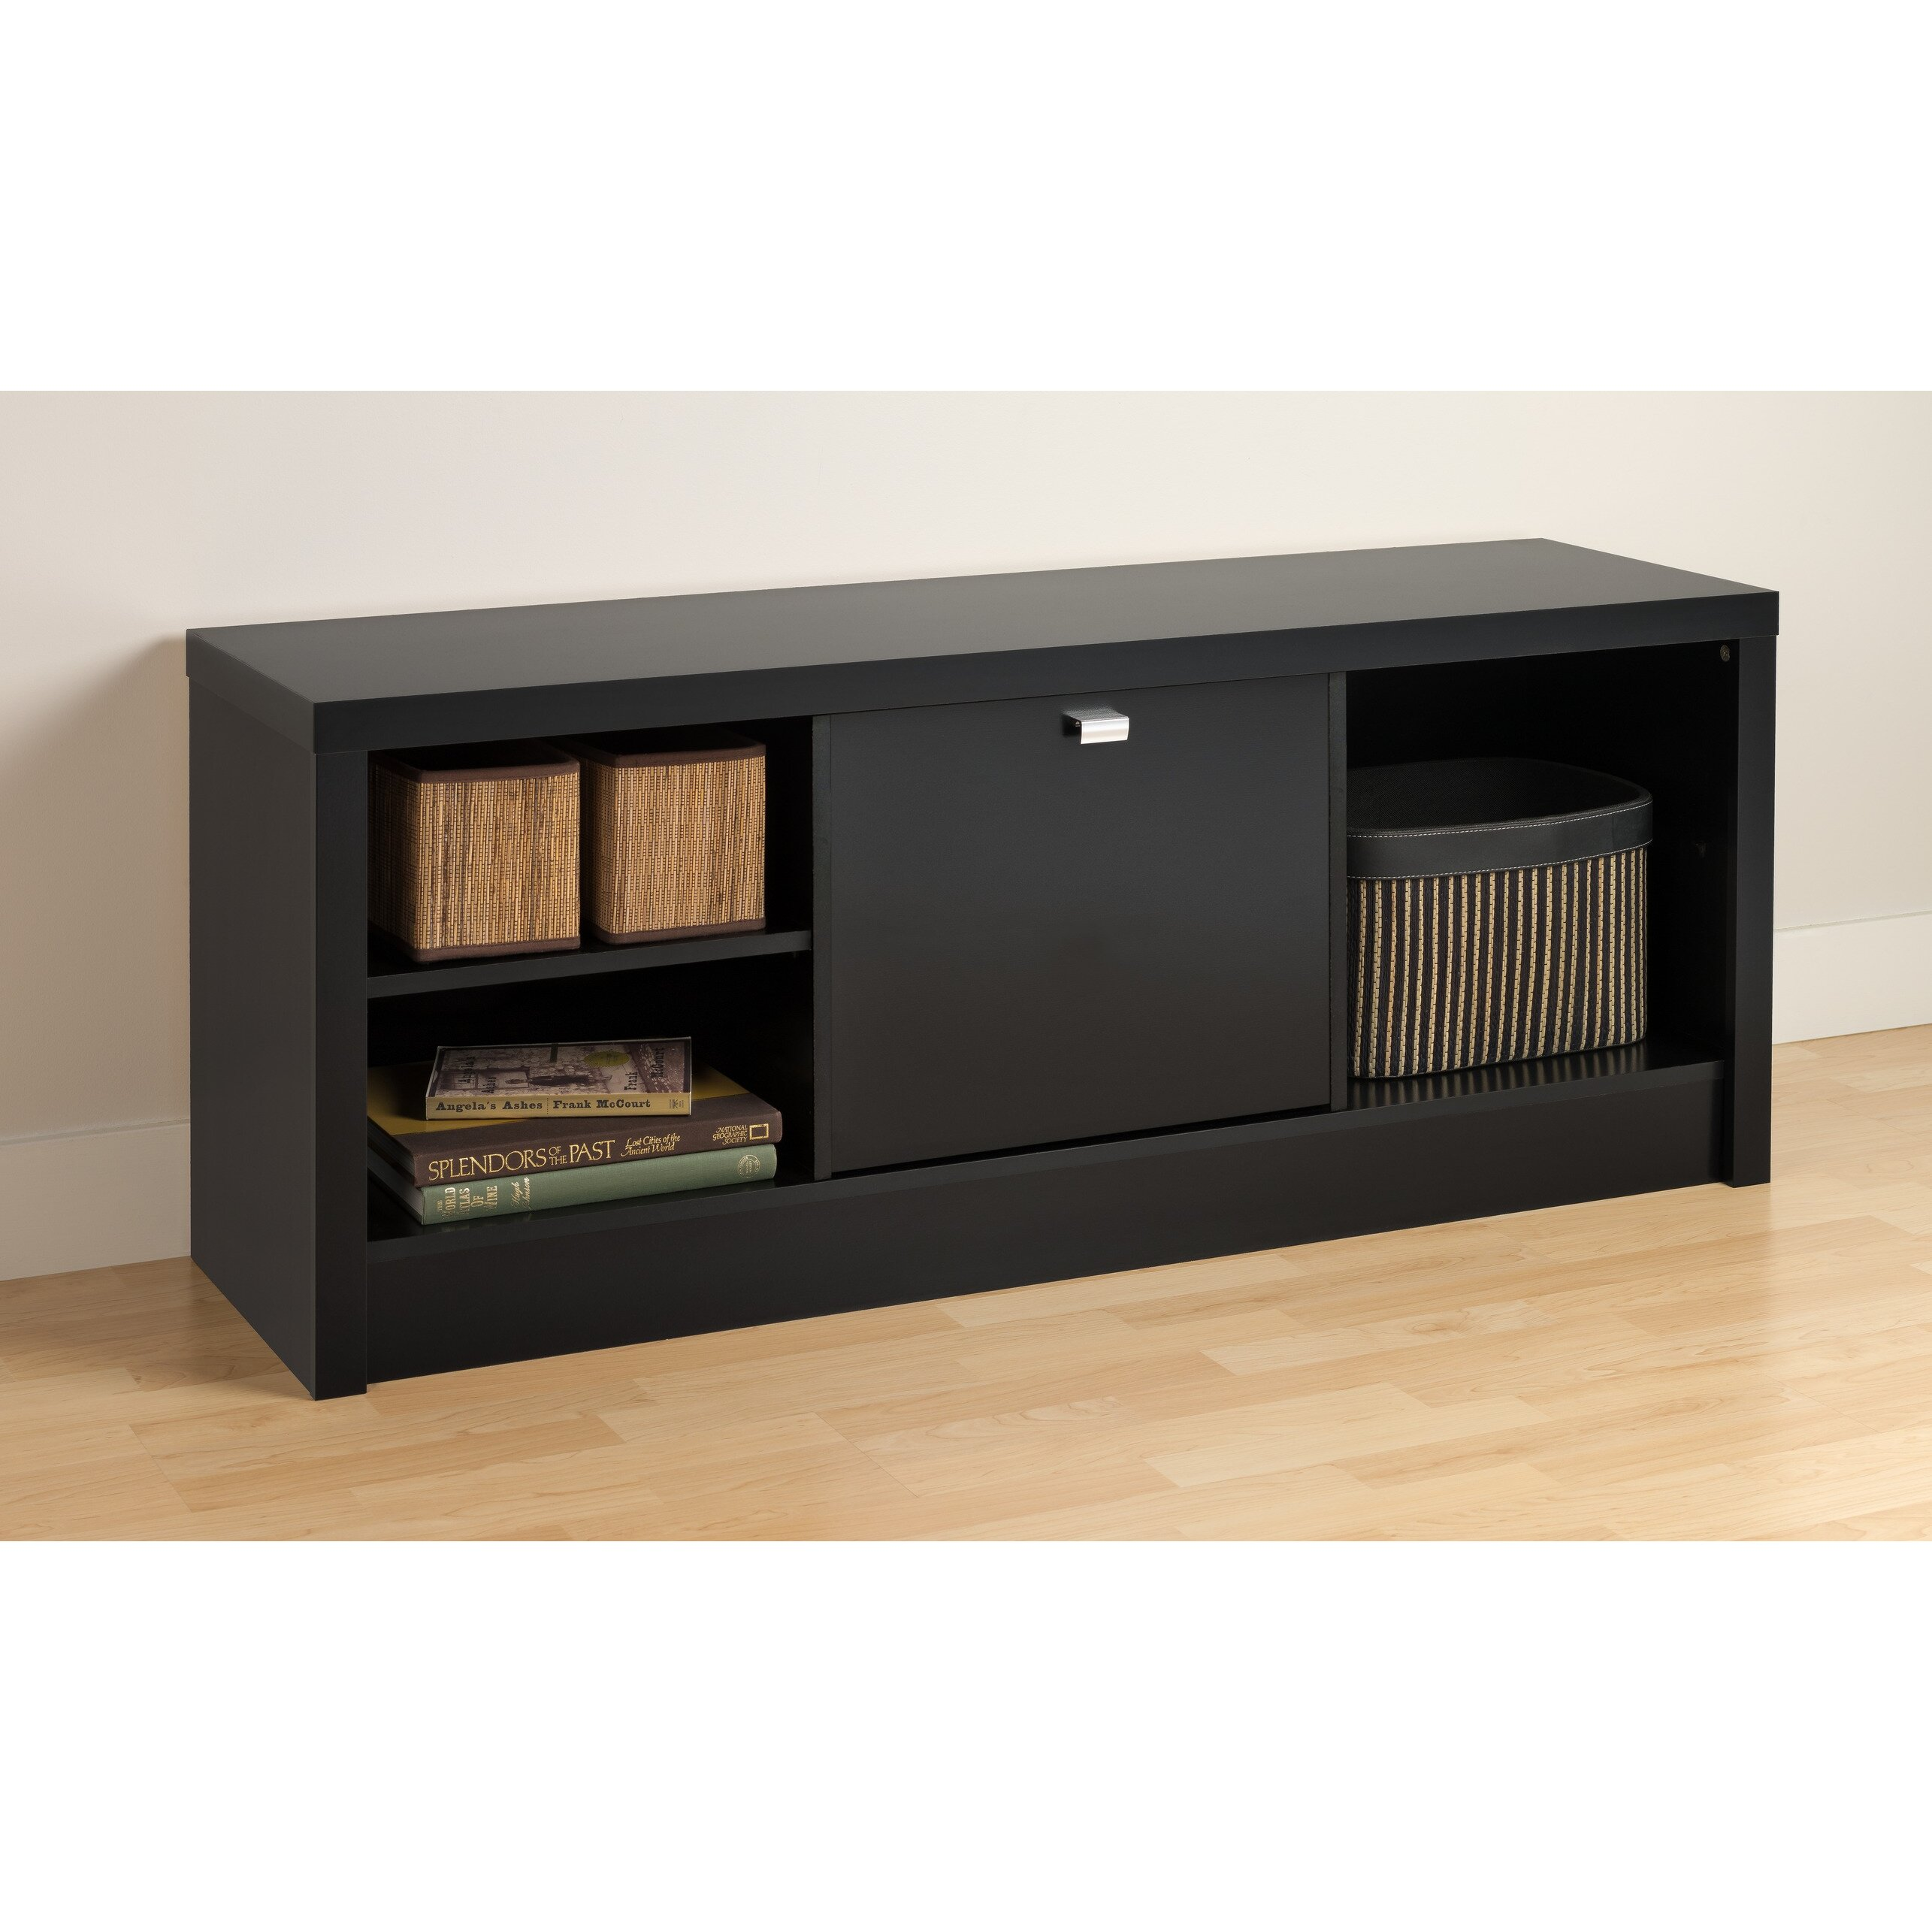 Prepac Bedroom Cubbie Storage Bench & Reviews